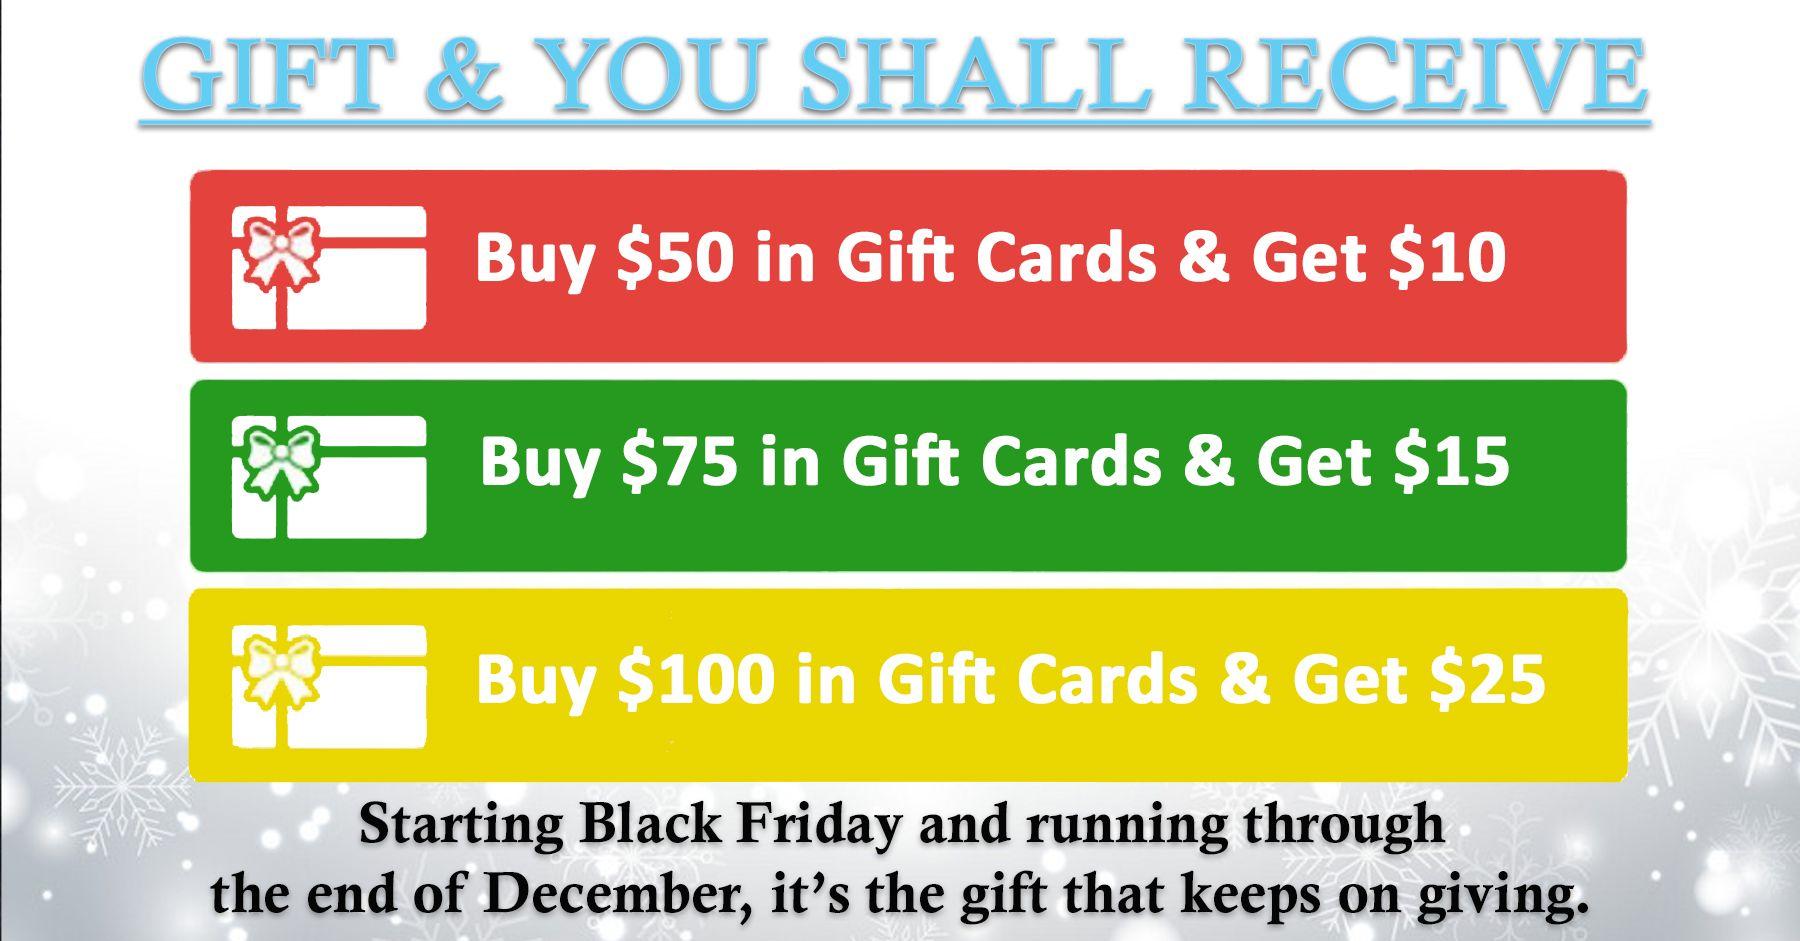 gift_card_promo_tabletop.jpg